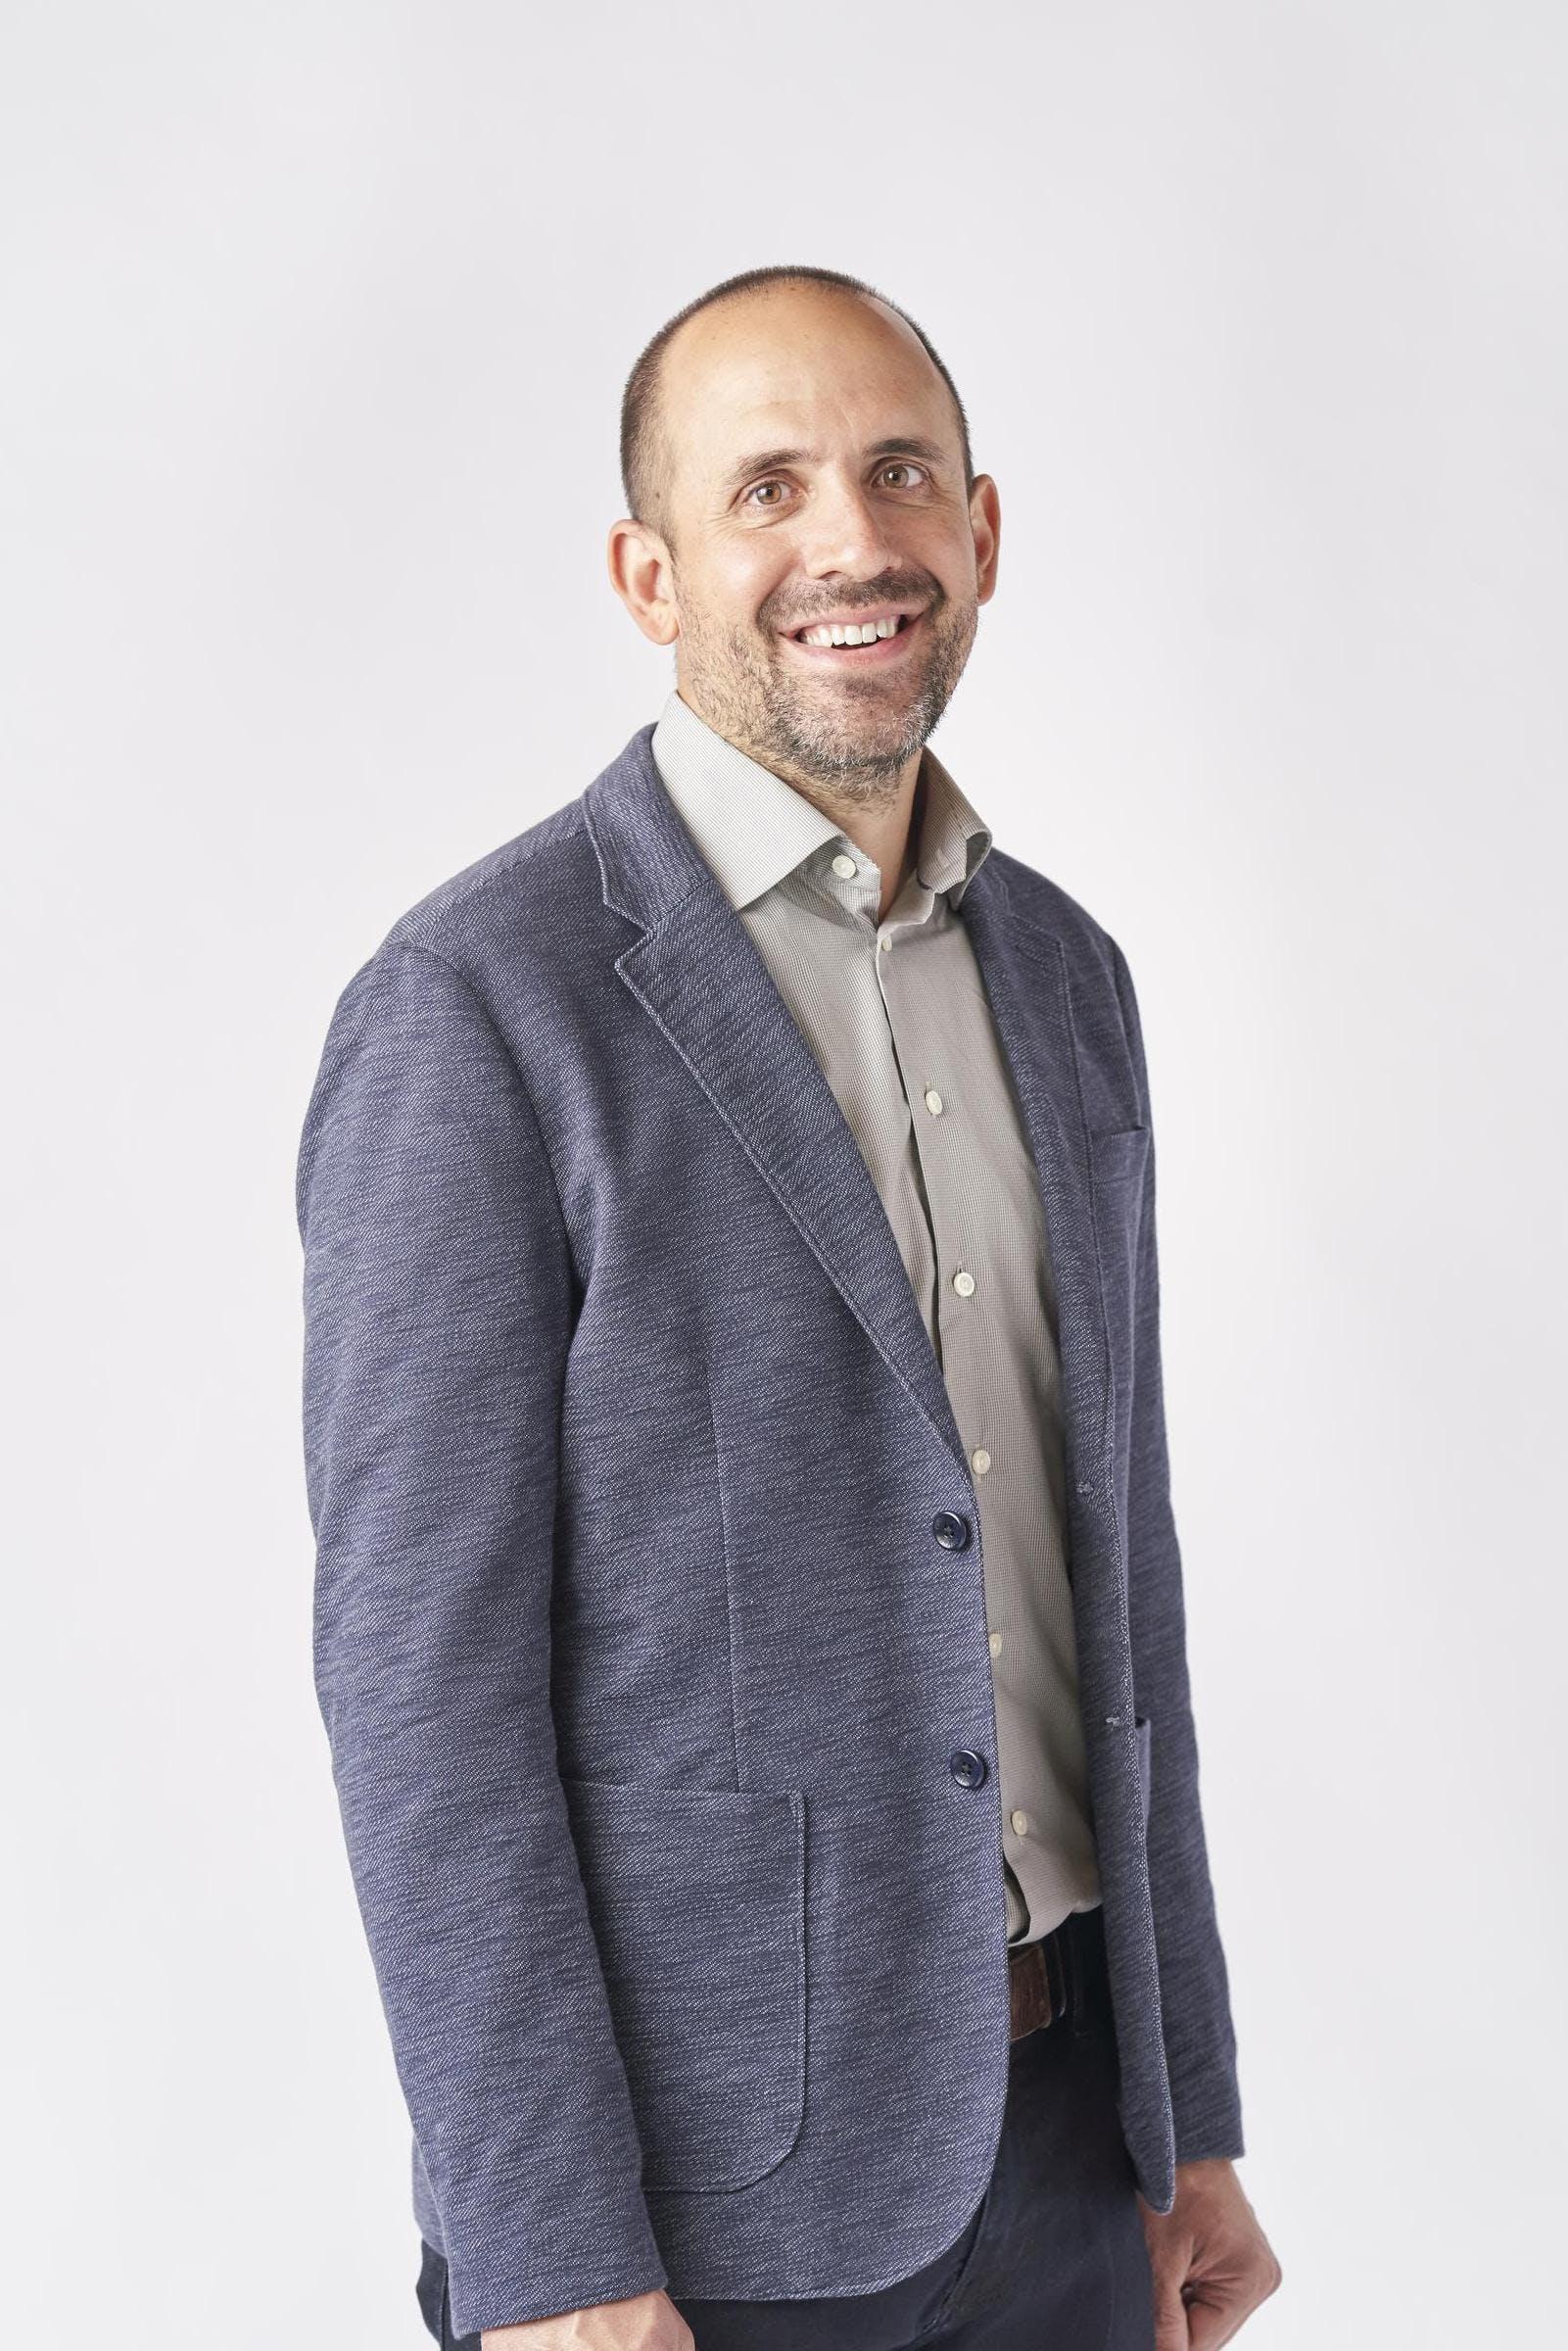 Eric Breon, Director